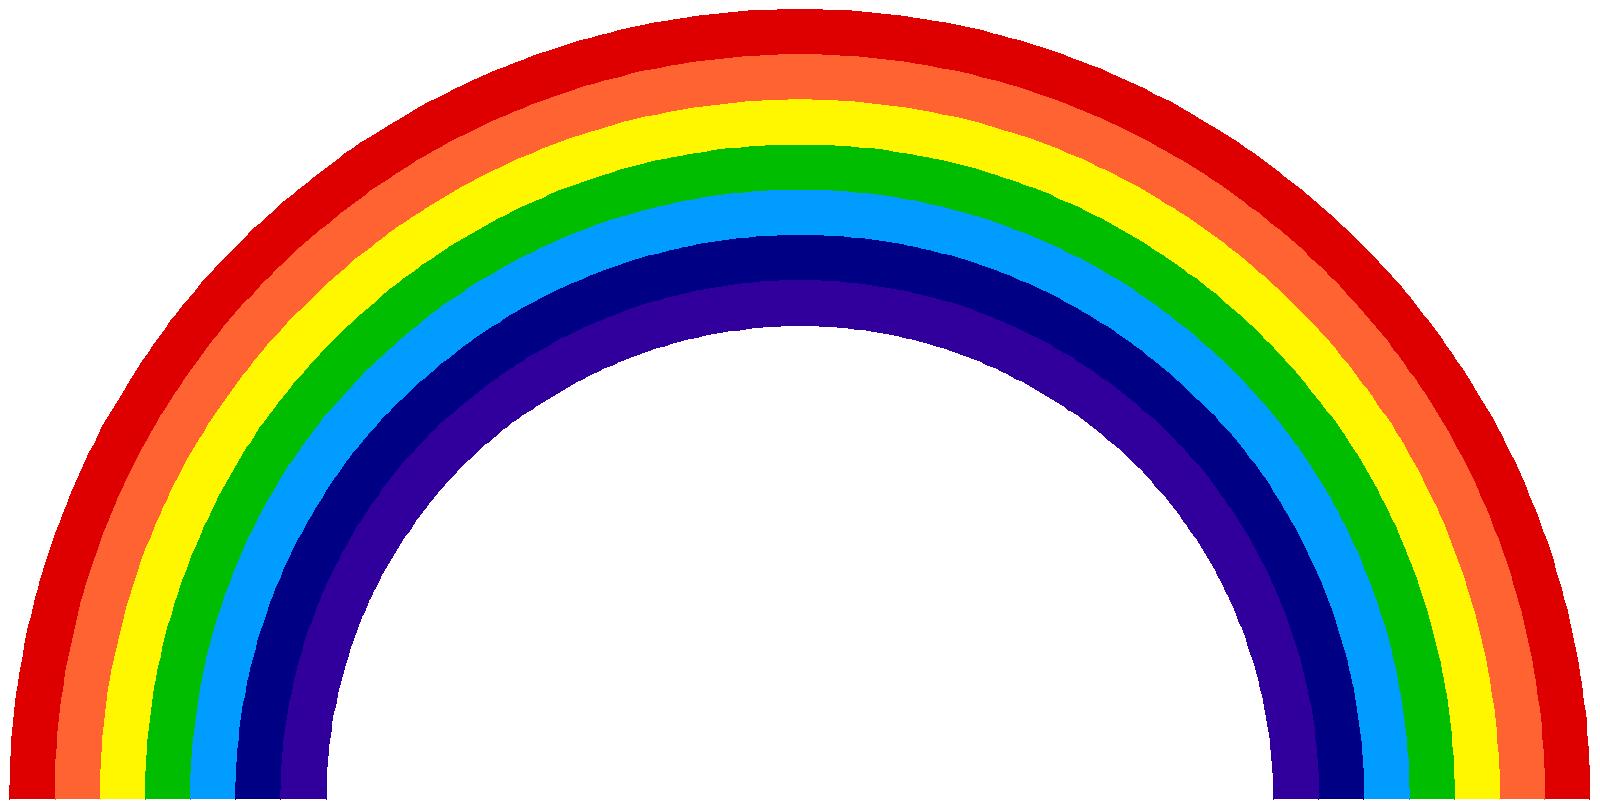 Rainbow PNG Transparent Images.